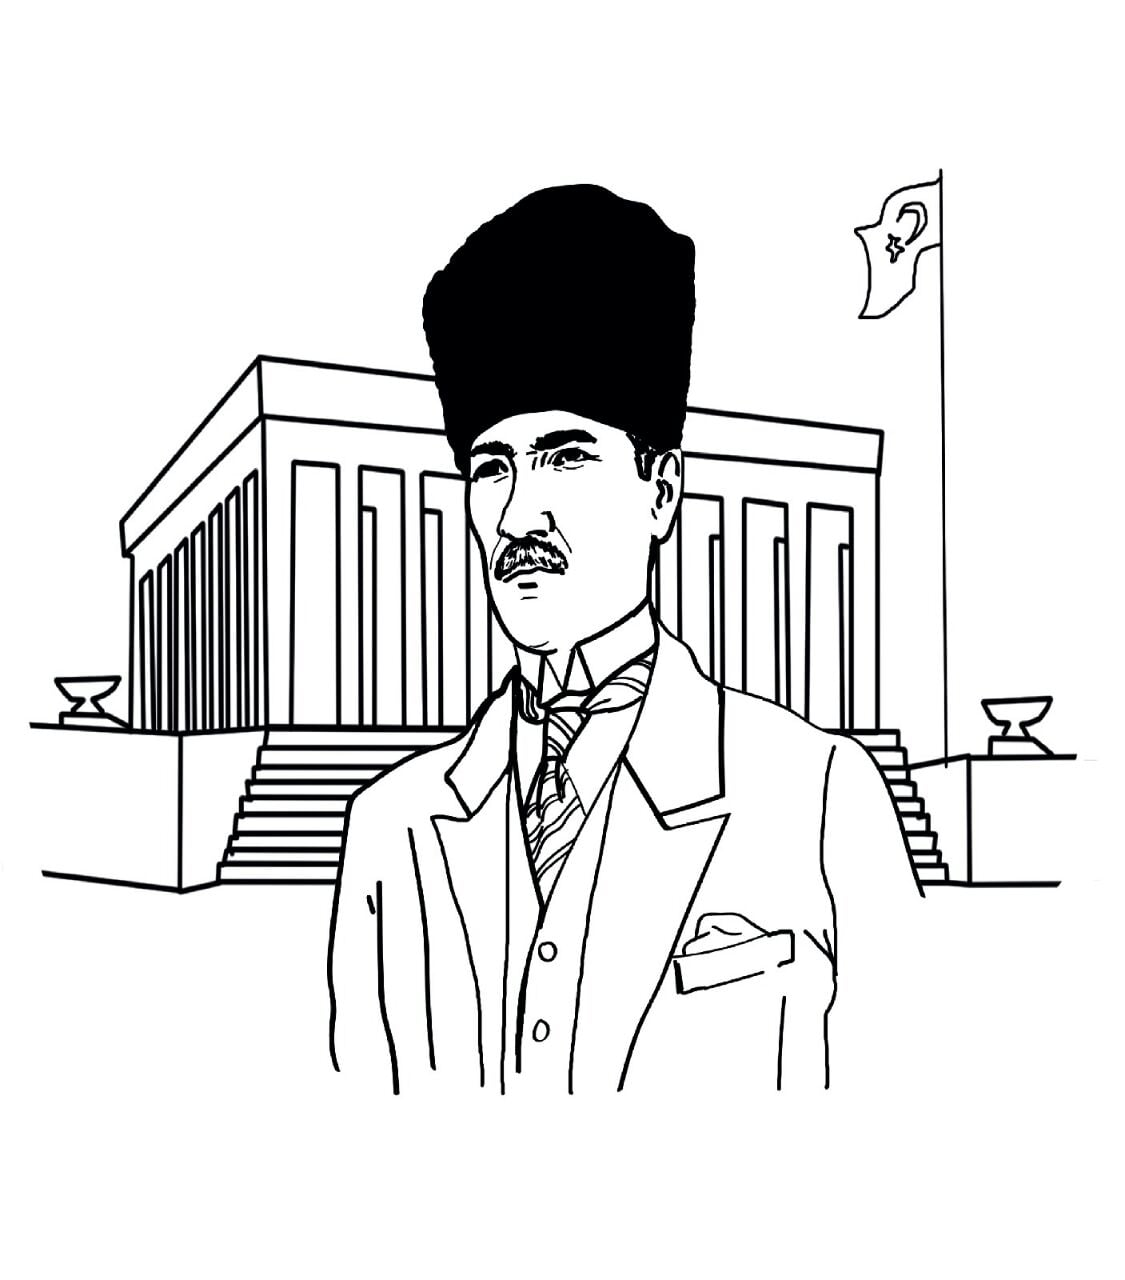 Ataturk 10 Kasim Boyama Cizimleri Secdem